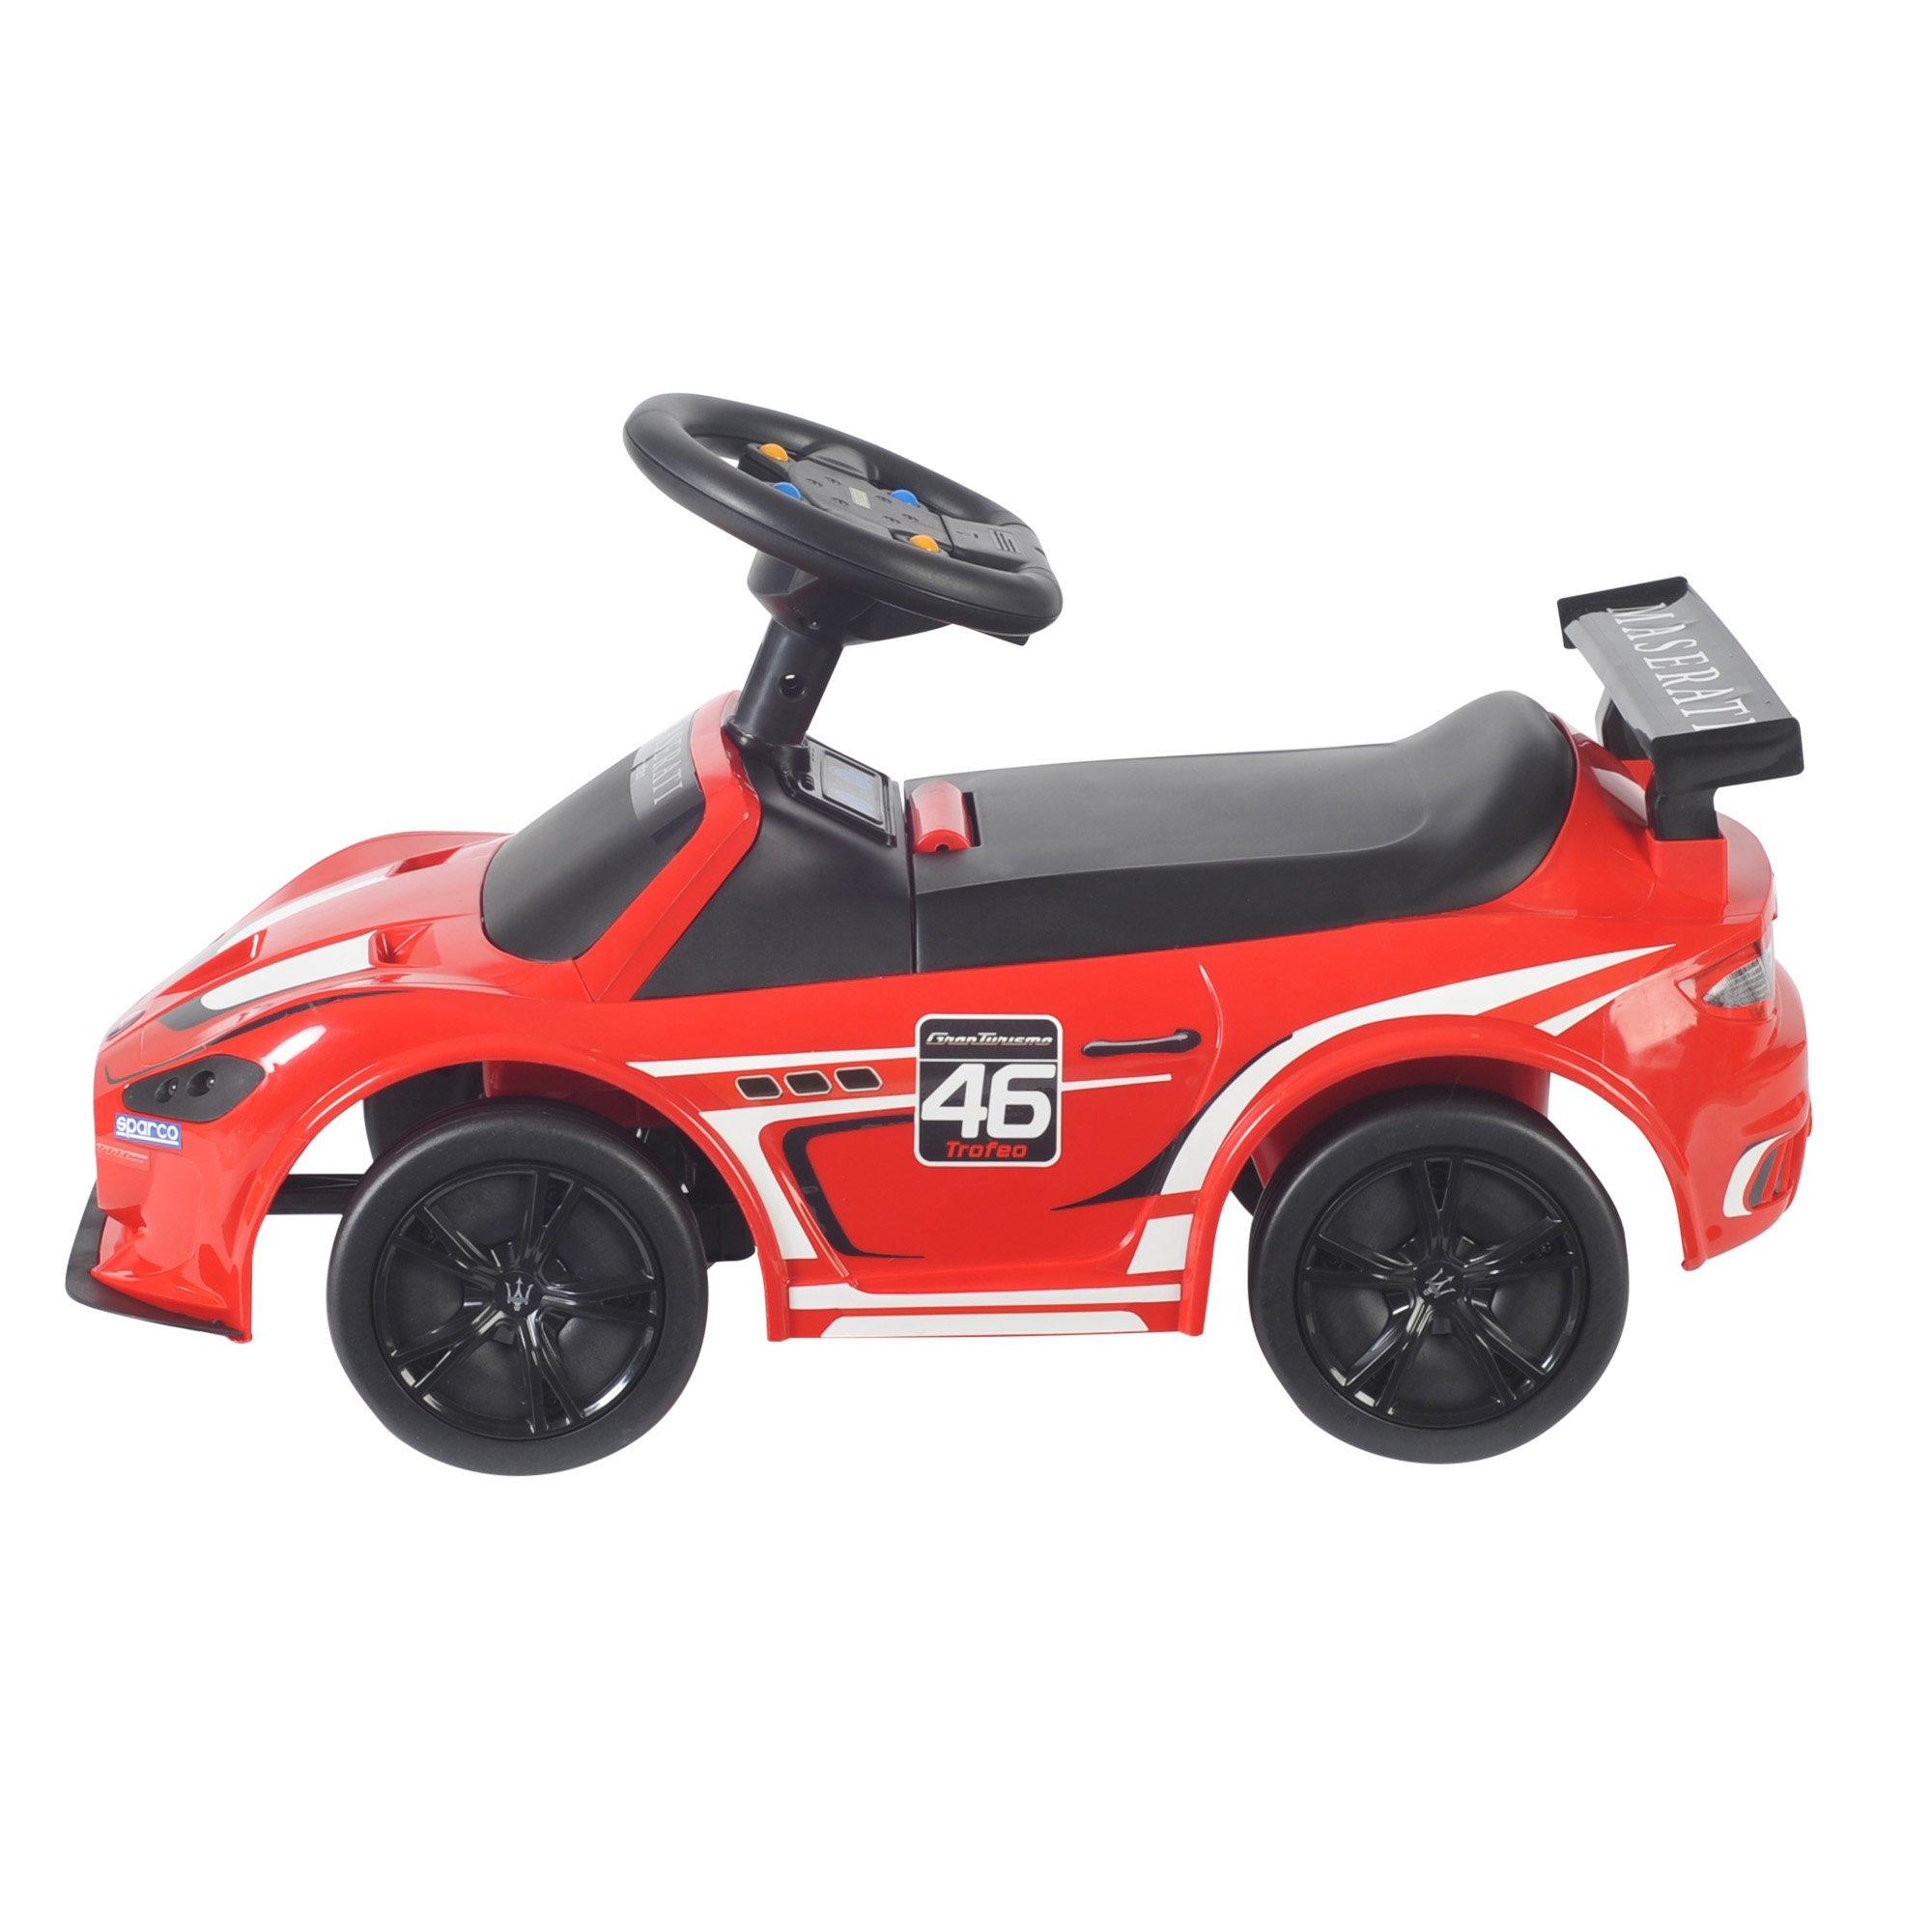 1:4 Maserati Trofeo Red Toy Car